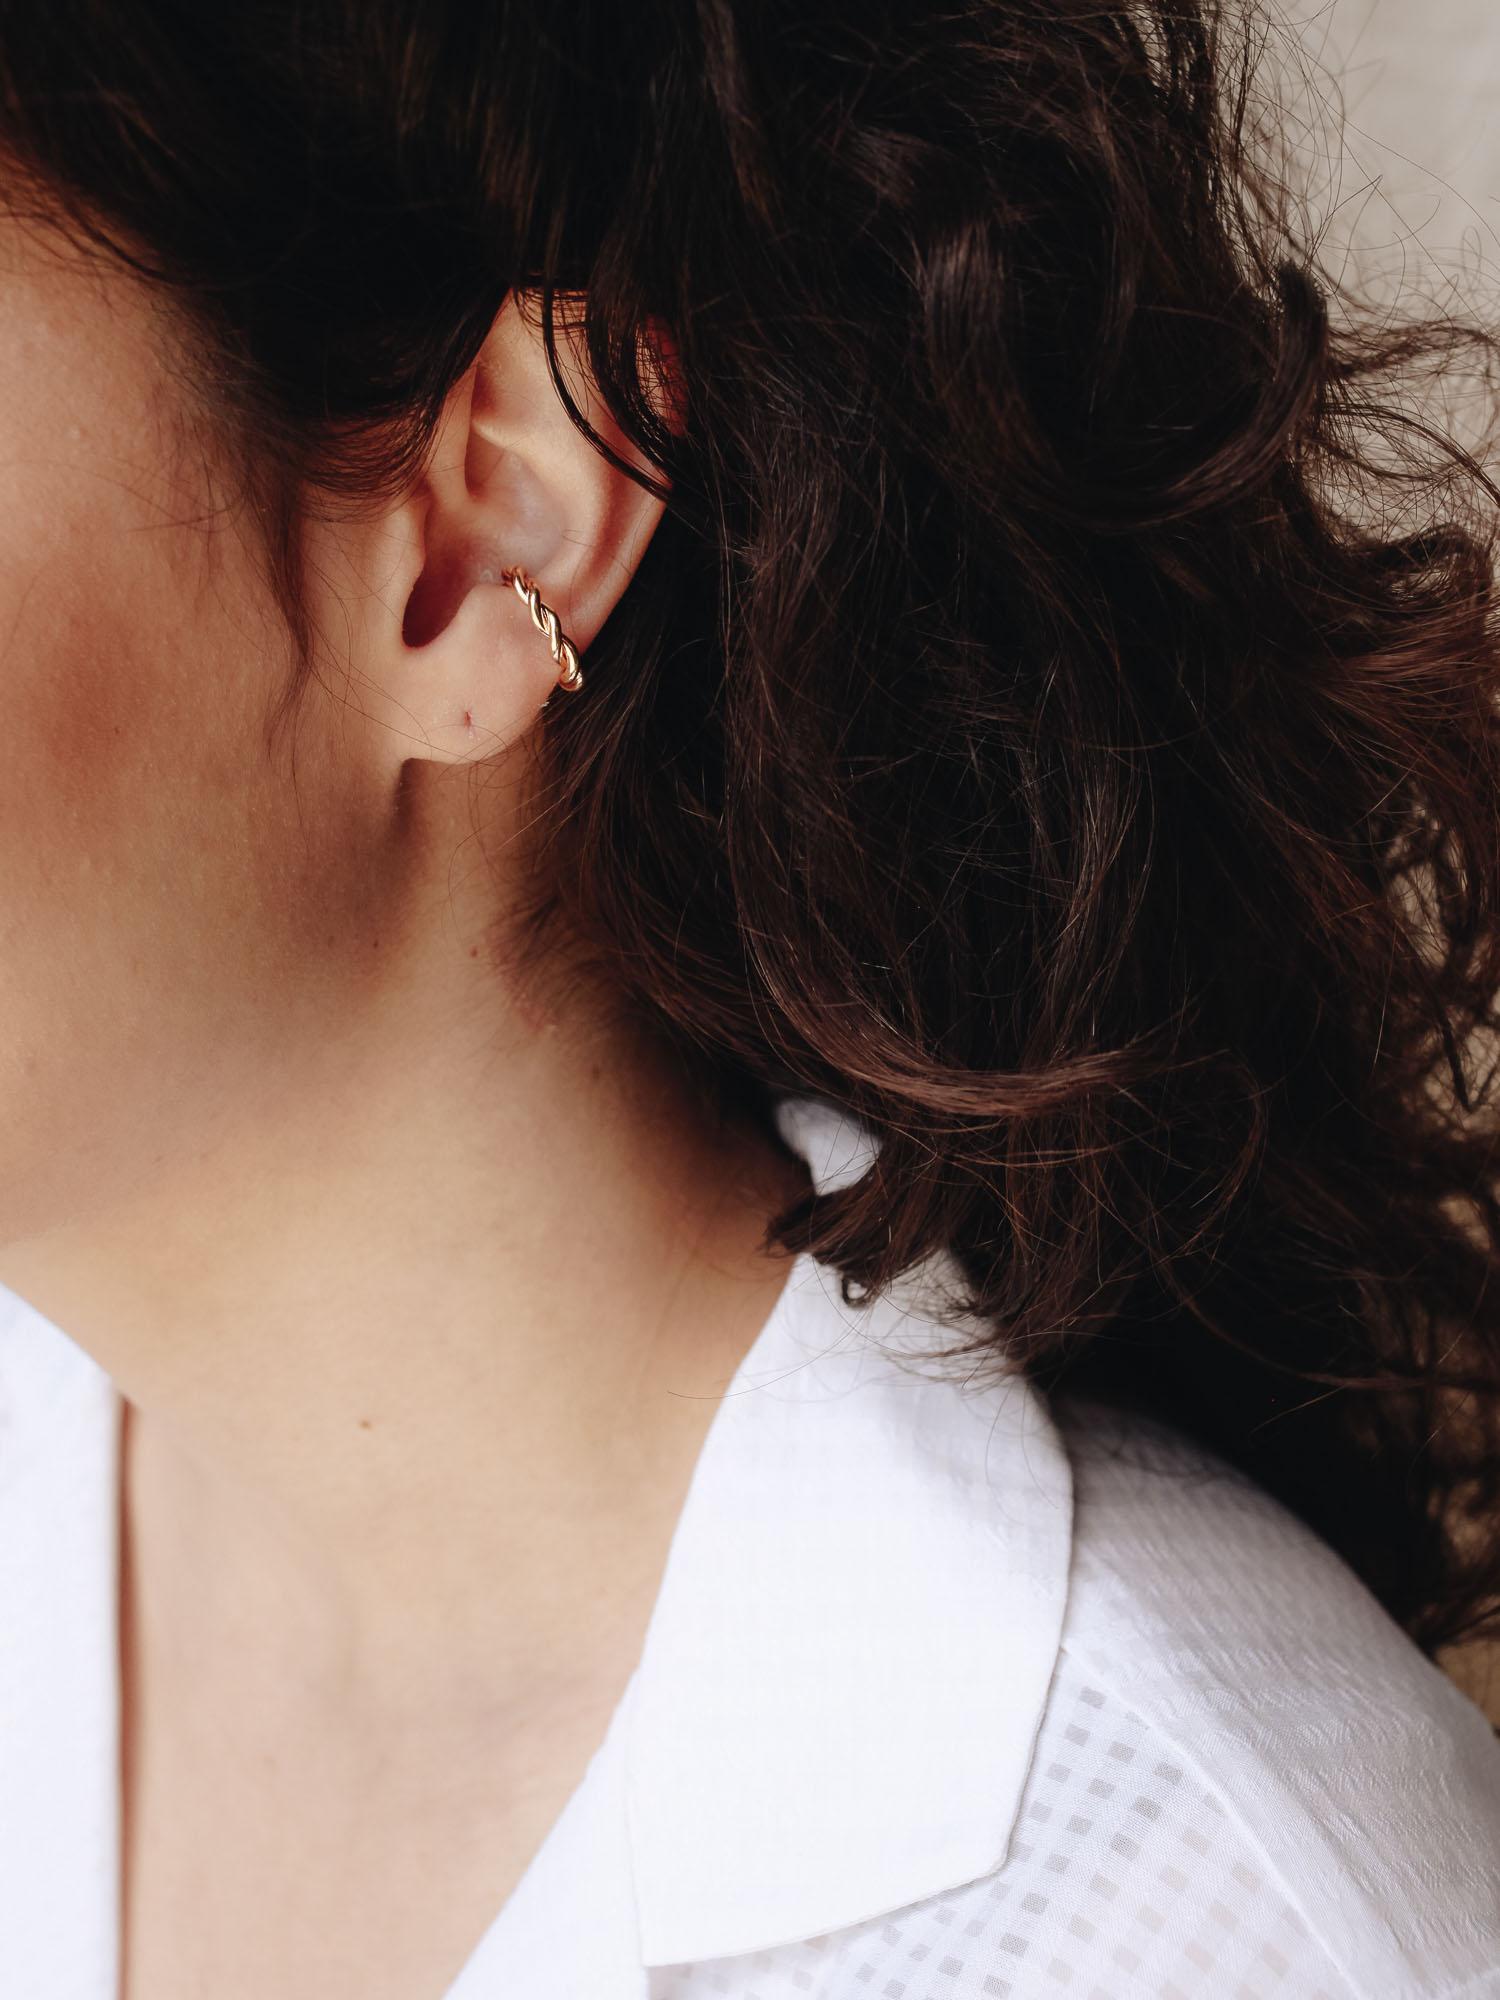 Fake Piercing Cissa